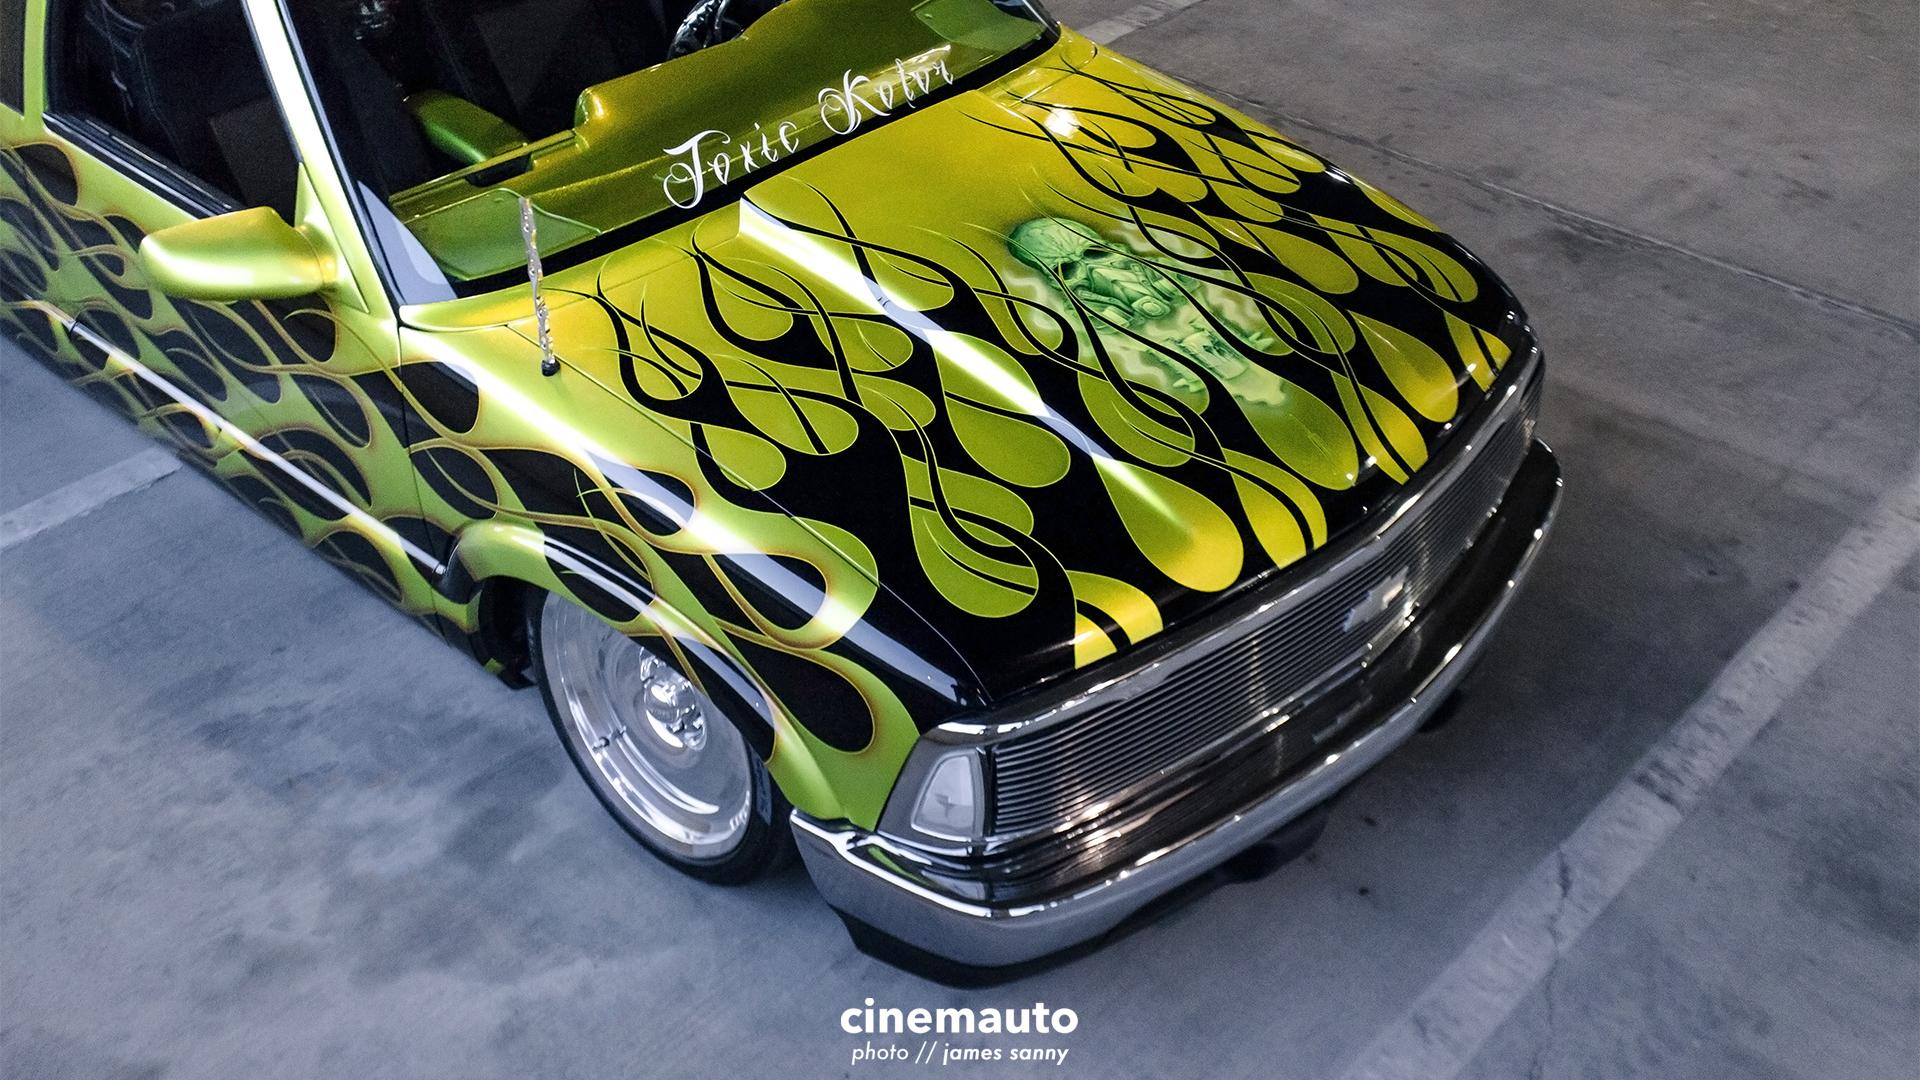 cinemauto-wichita-automotive-photographer-james-sanny-Tsm.jpg